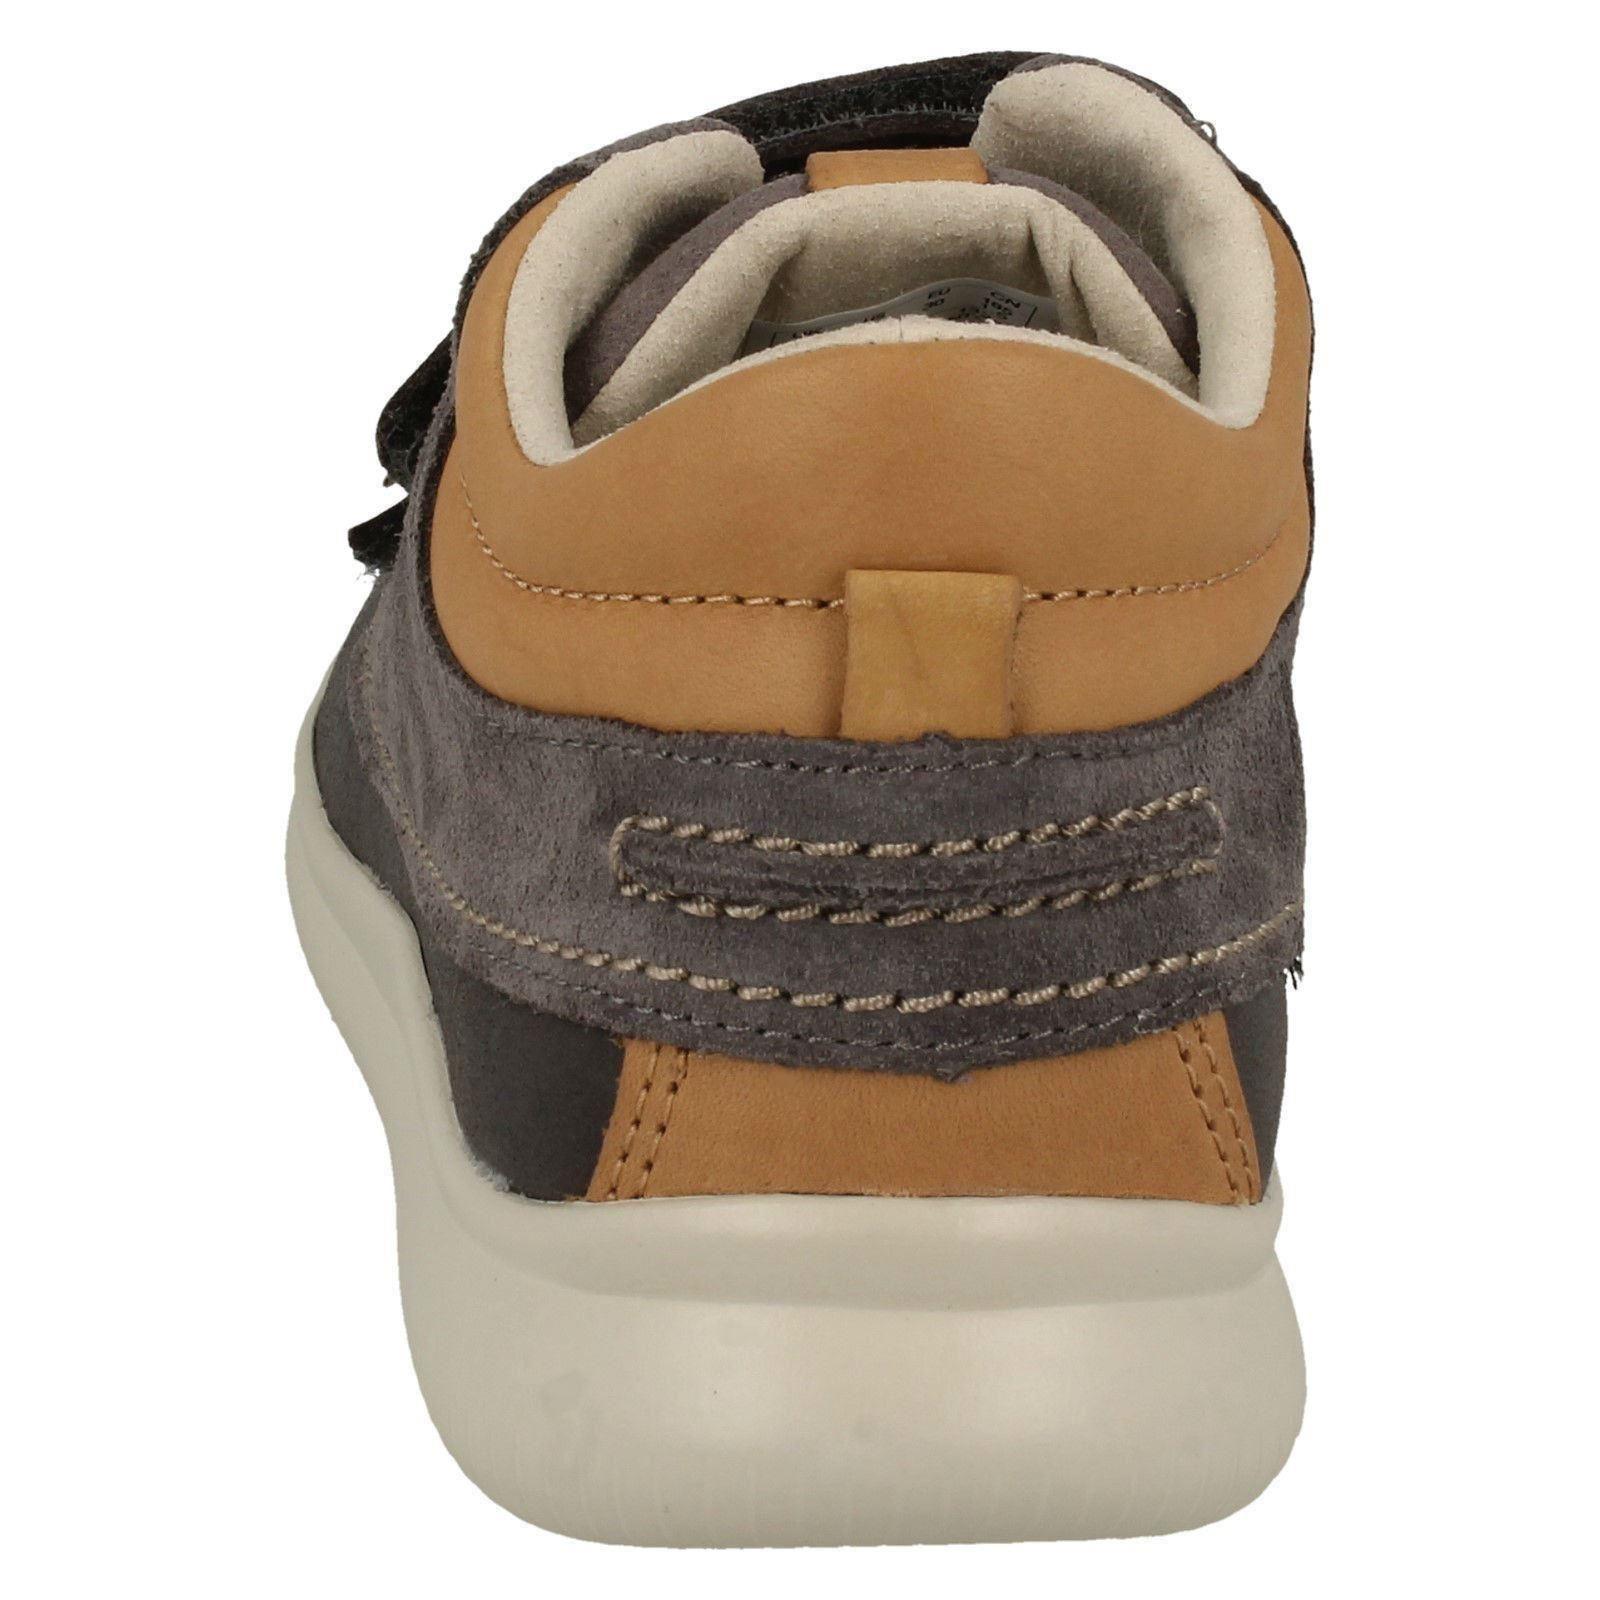 Cloud Tuktu /'Boys Clarks/'  Ankle Boots